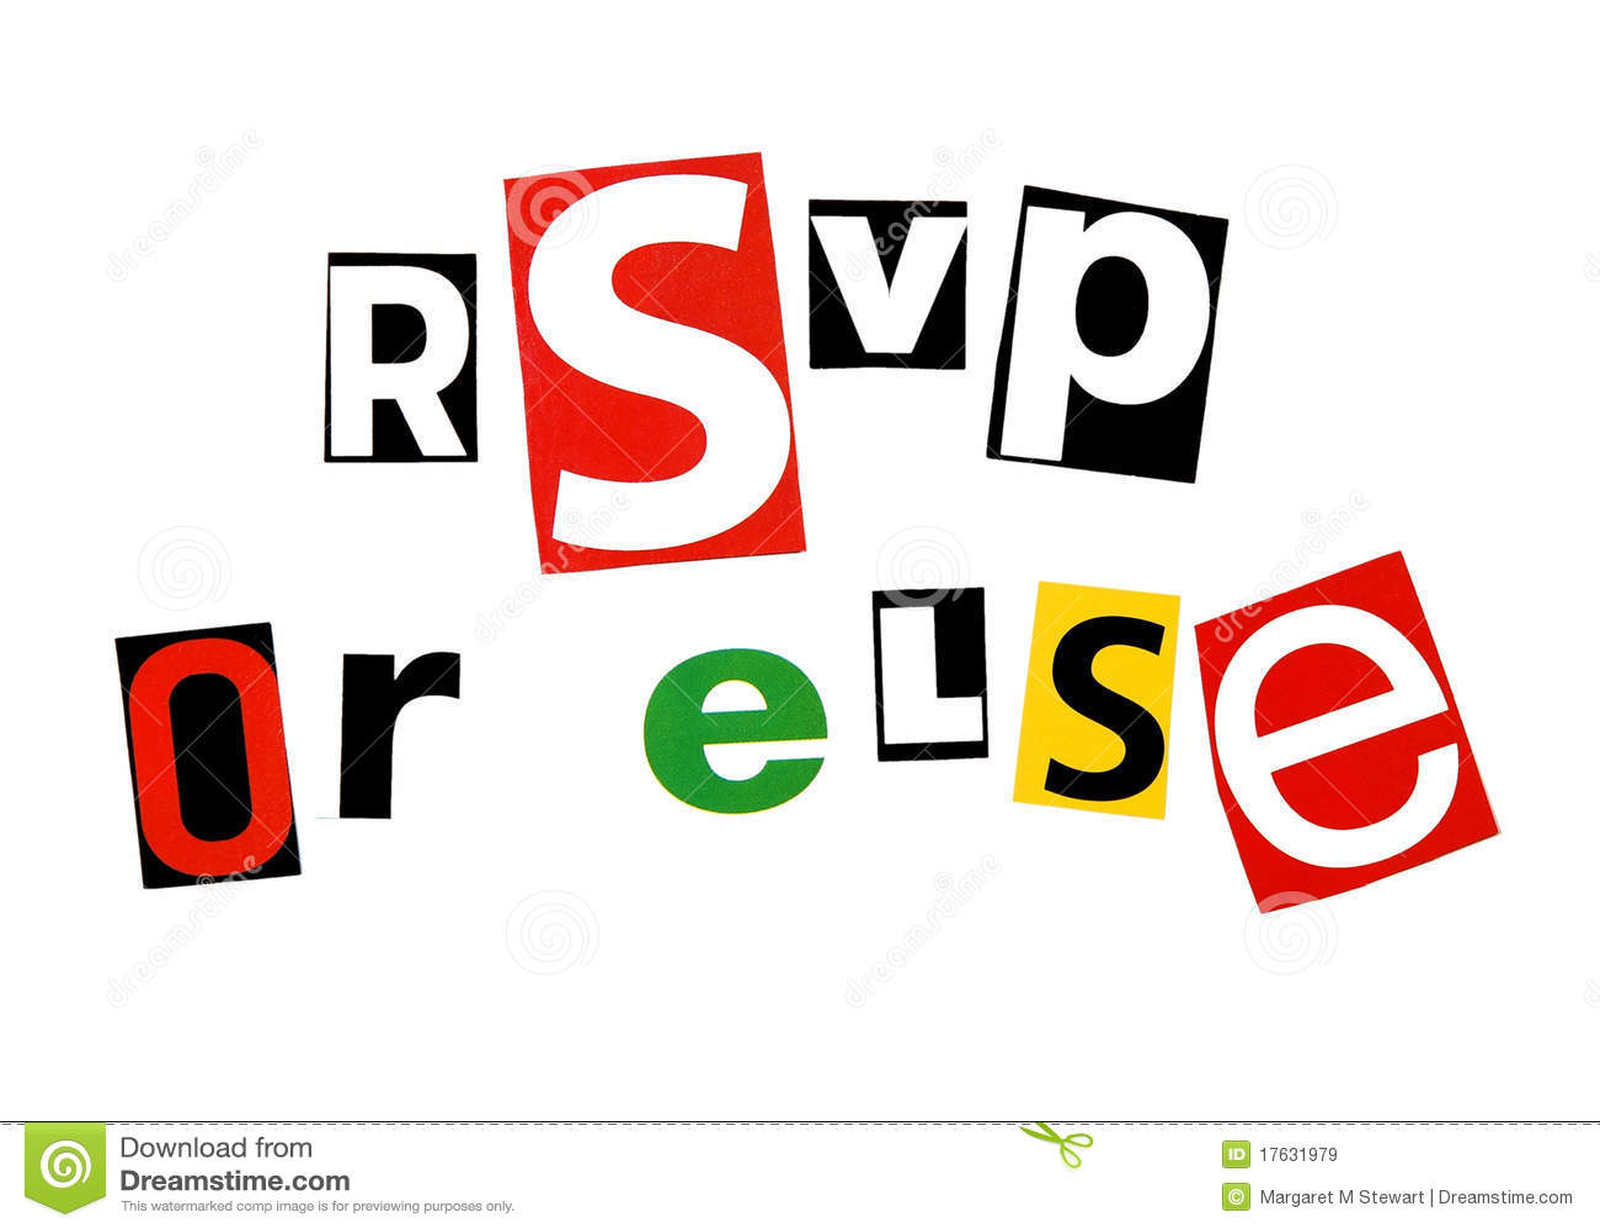 Rsvp Or Else Royalty Free Stock Images Image 17631979